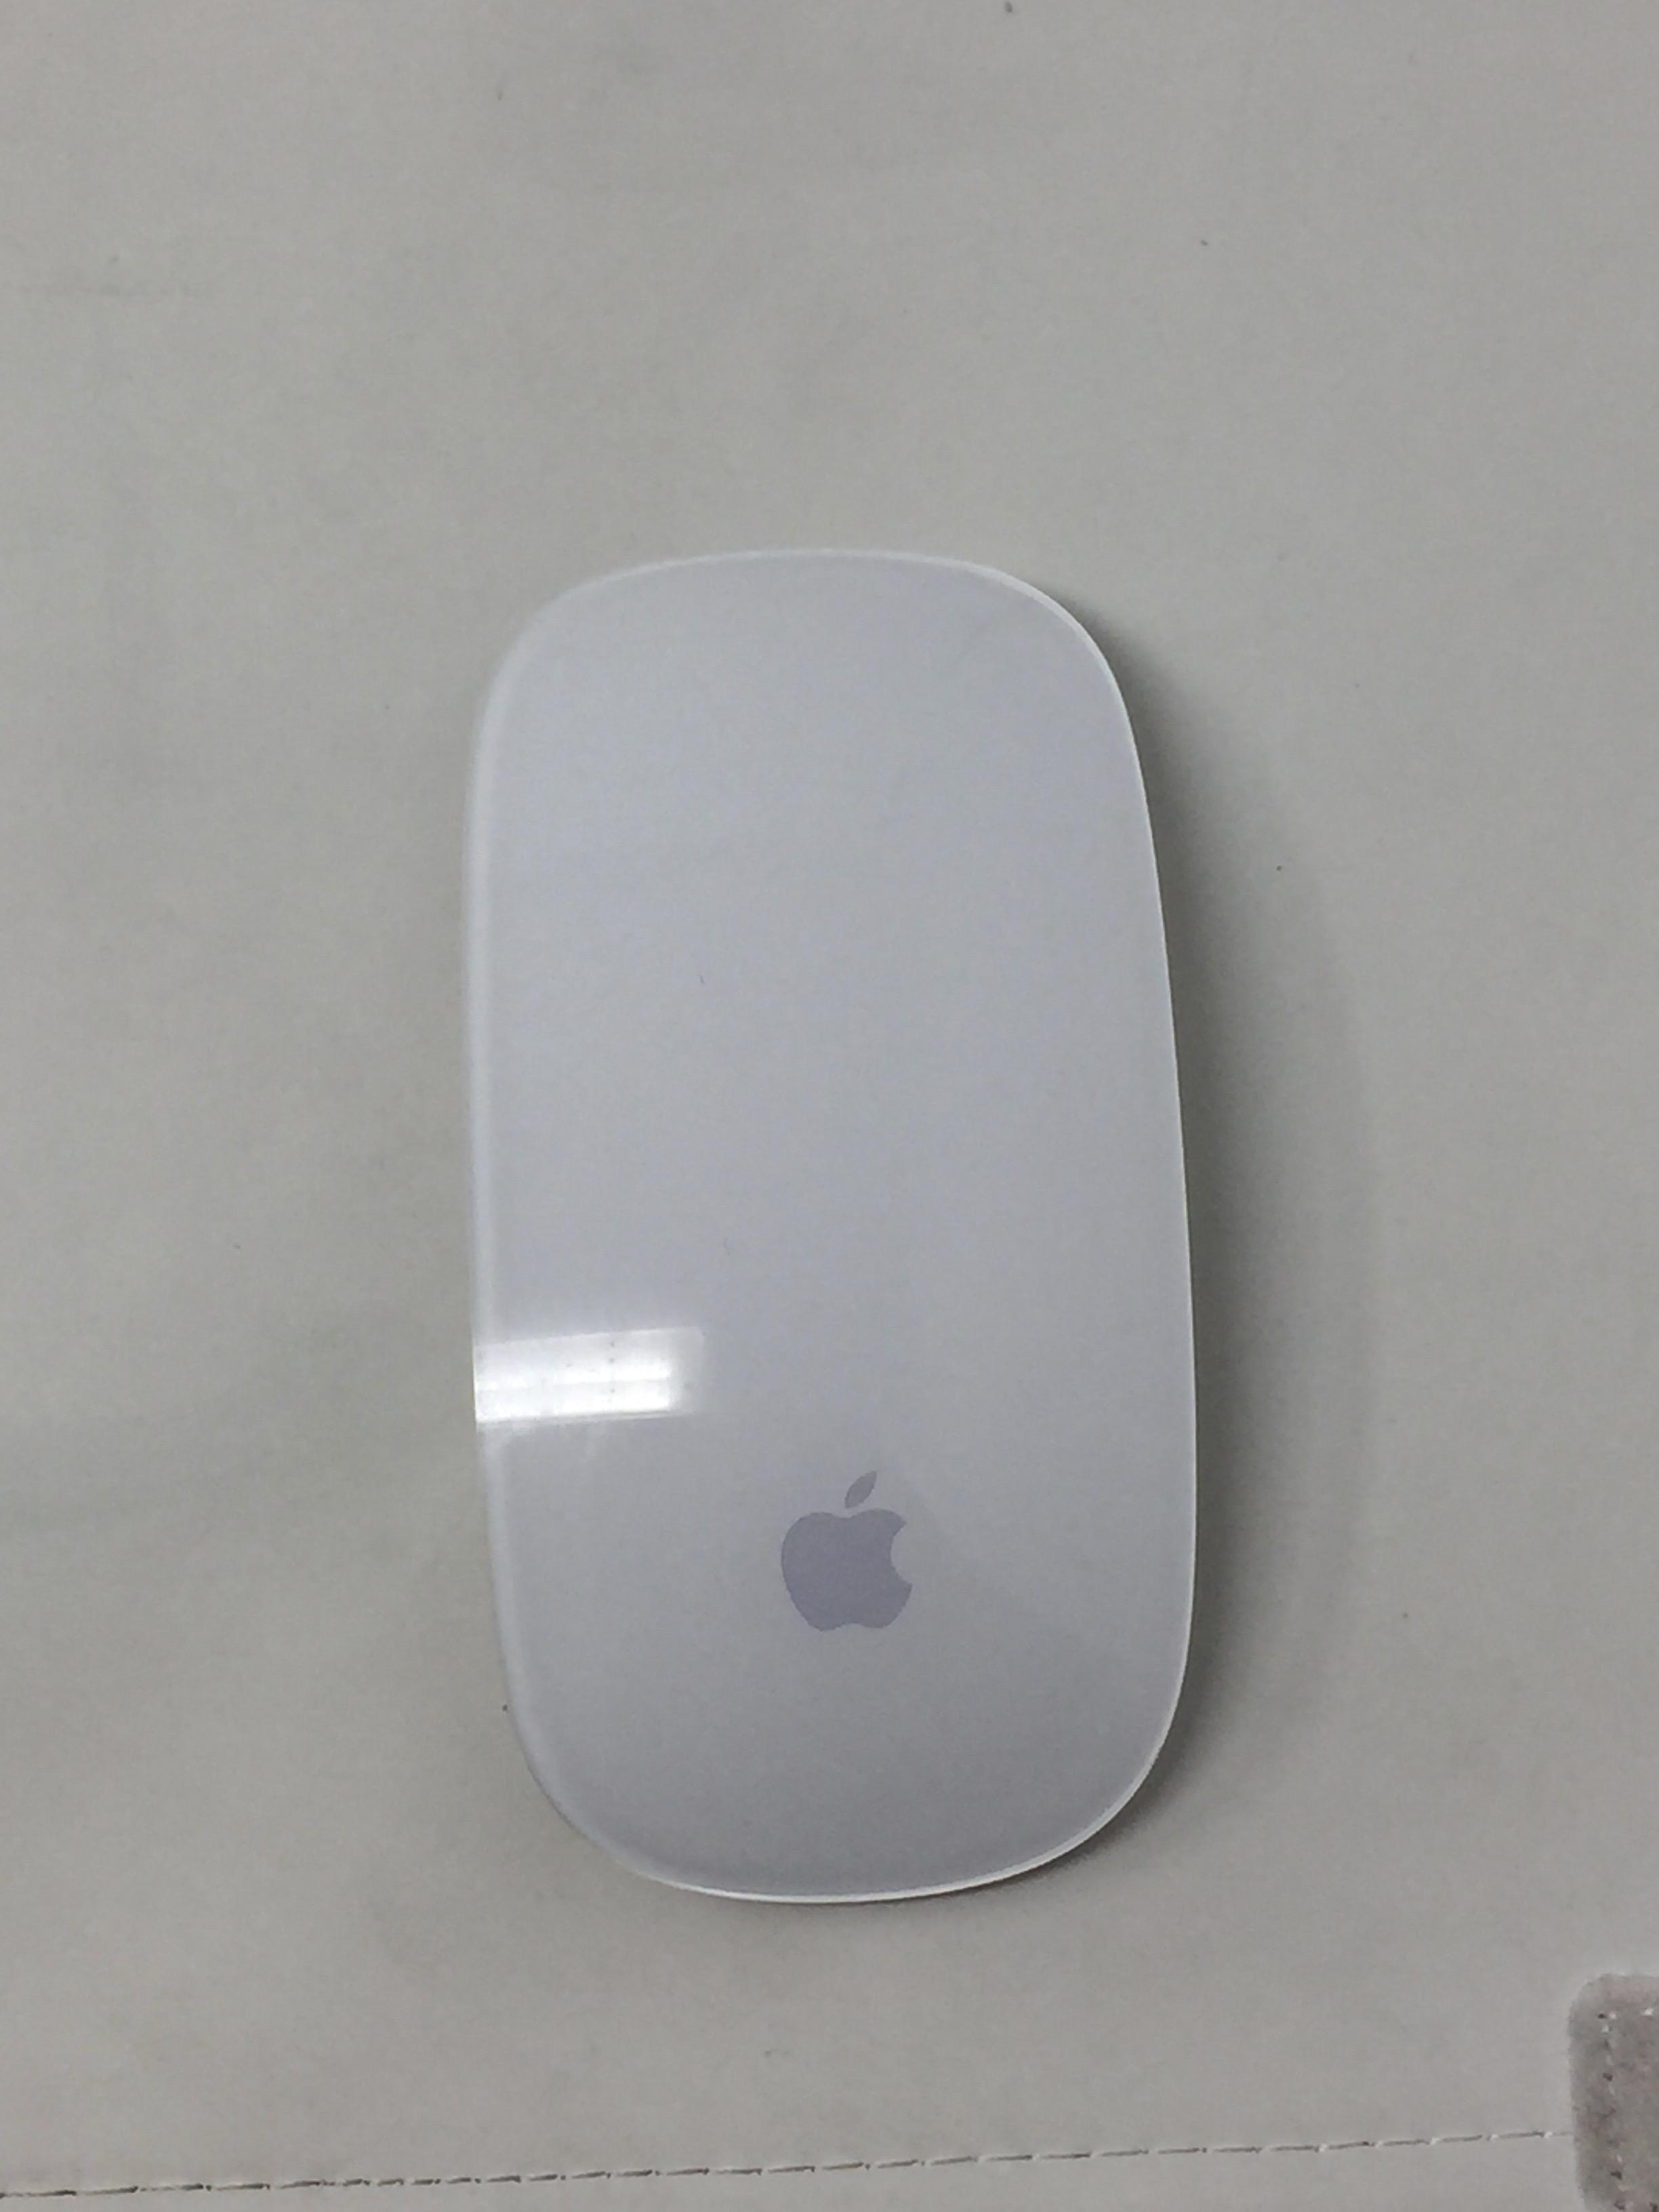 Mac Pro Mid 2012 (2 x Intel Xeon 2.66 GHz 32 GB RAM 1 TB SSD), 6 Core Intel Xeon 2,66 GHz (tiene 2  procesadores iguales), 48 GB DDR3 (ECC) 1333MHz, 4 SSD de 512 GB cada una, imagen 12